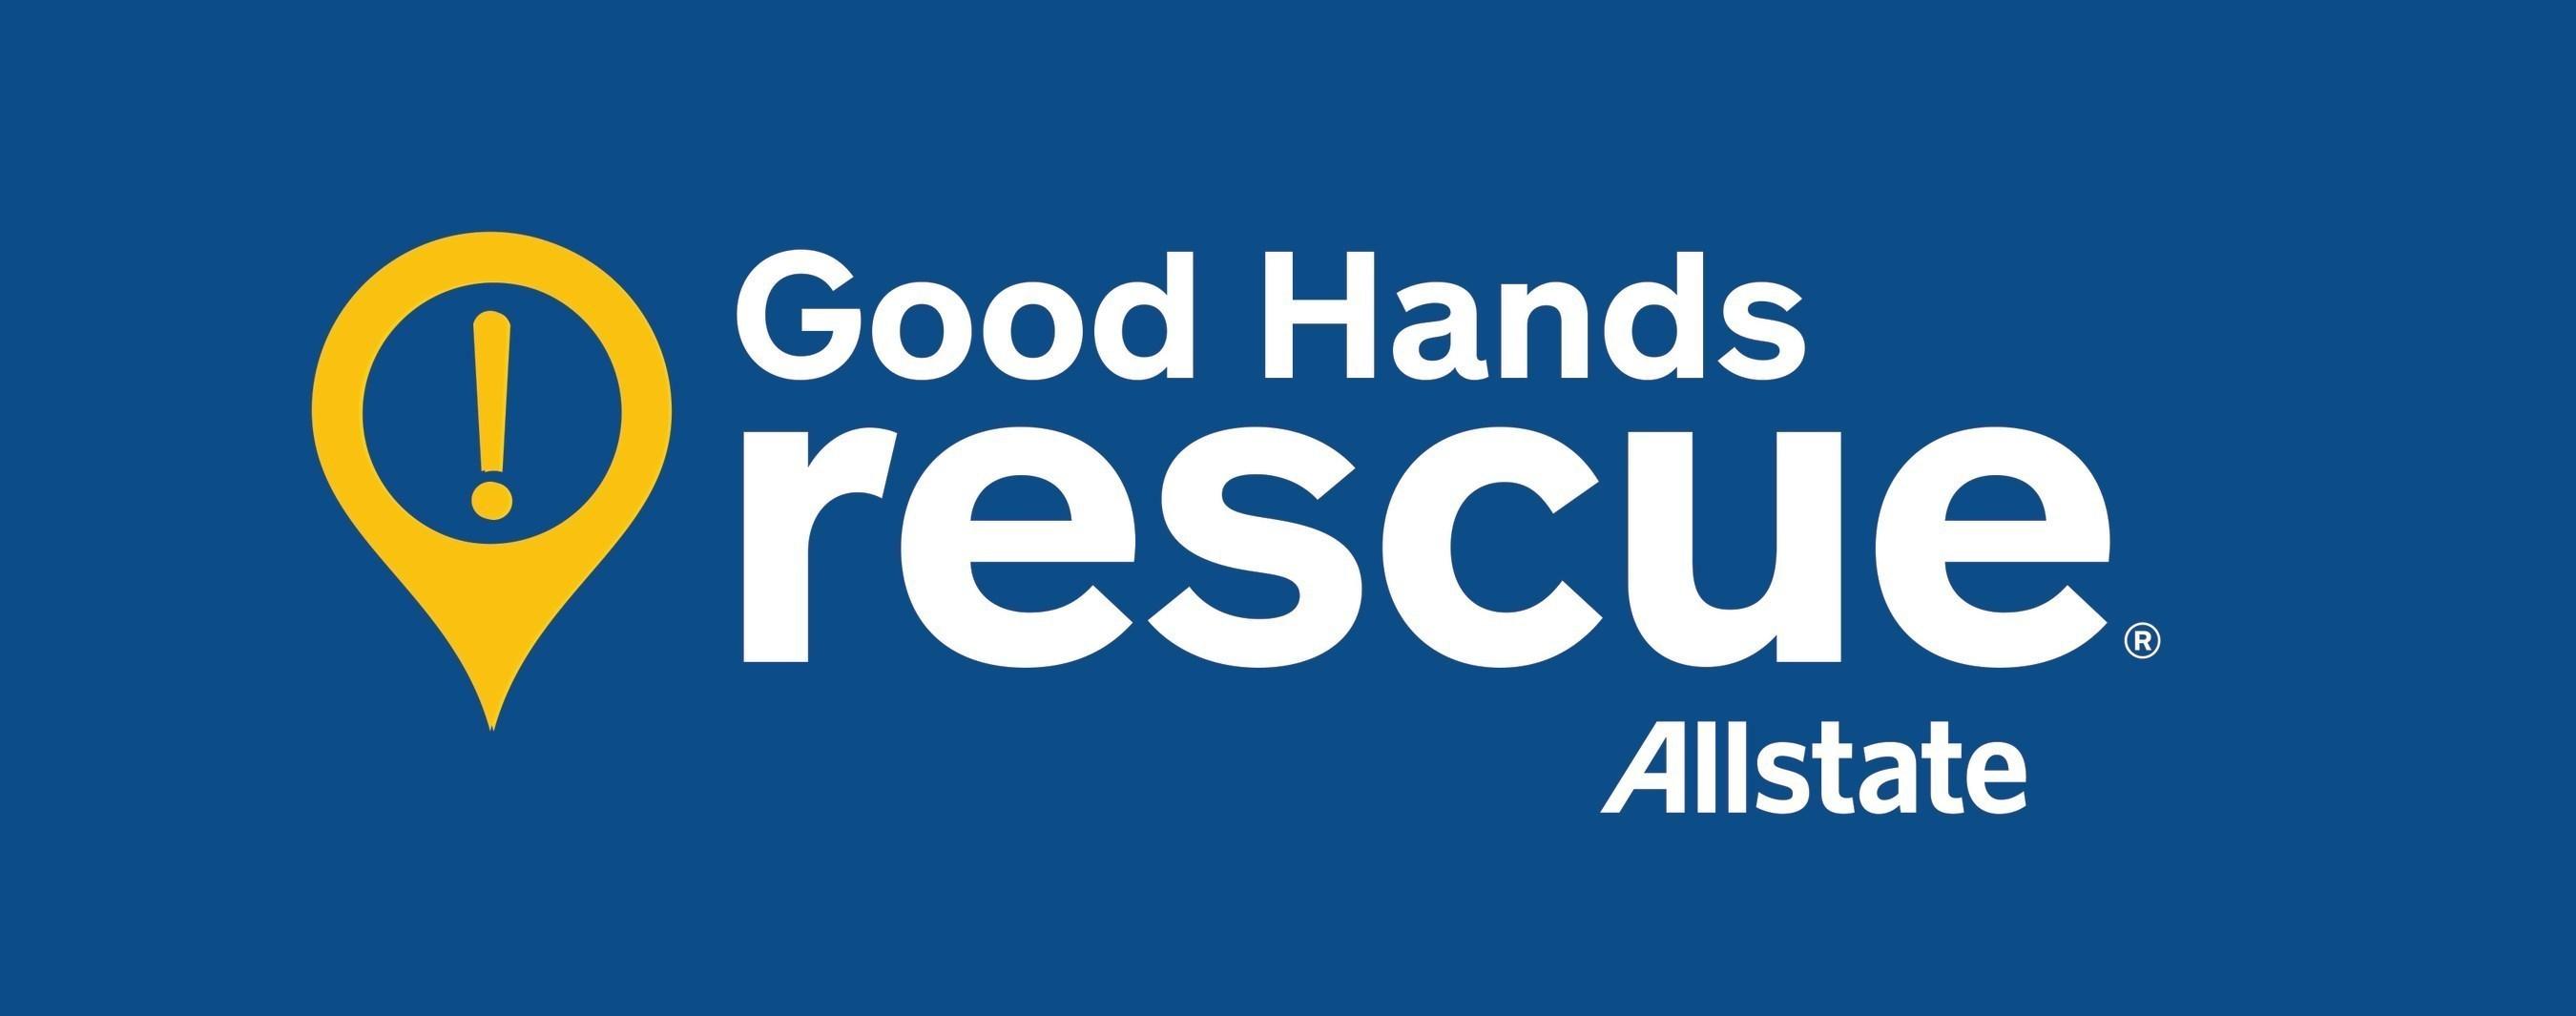 Allstate Good Hands Rescue(R)